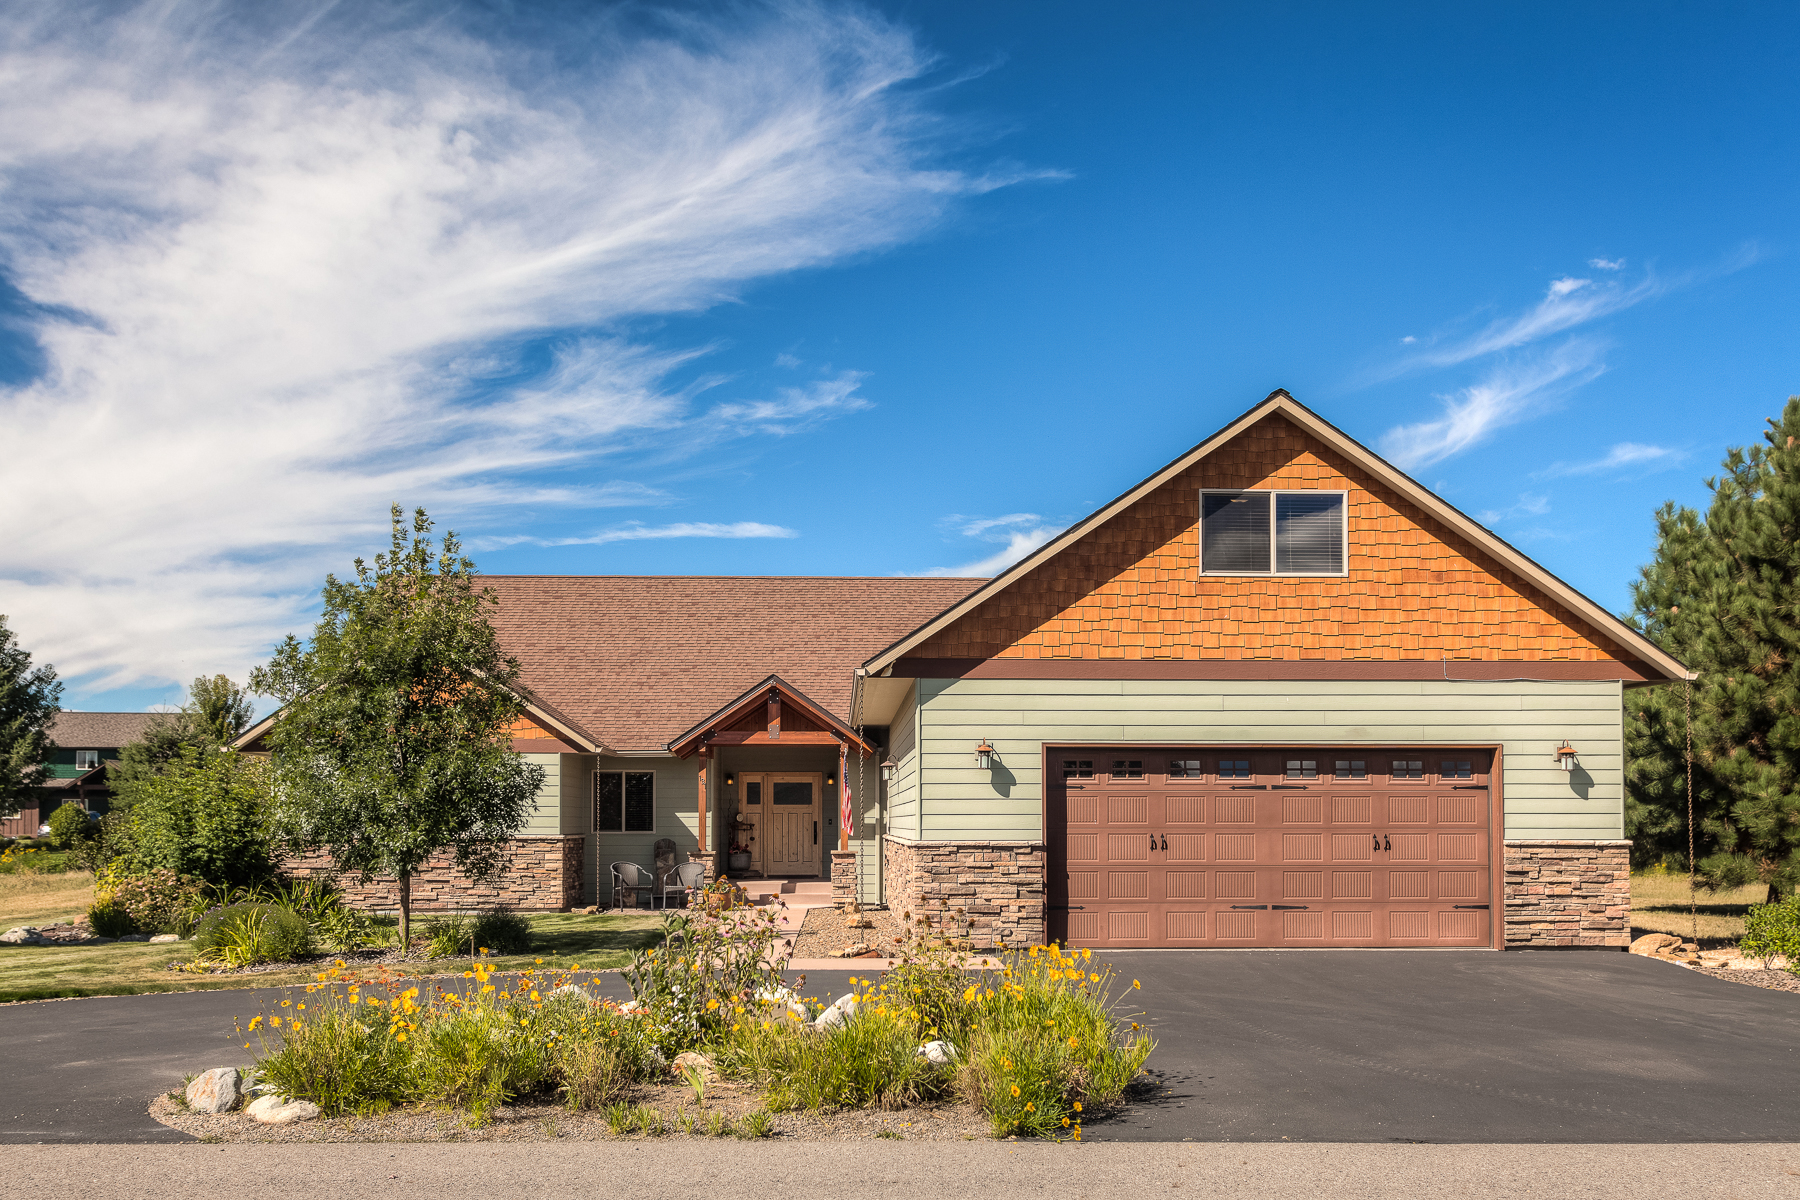 獨棟家庭住宅 為 出售 在 Quality Home in Stoneridge 131 Links Dr Blanchard, 愛達荷州, 83804 美國